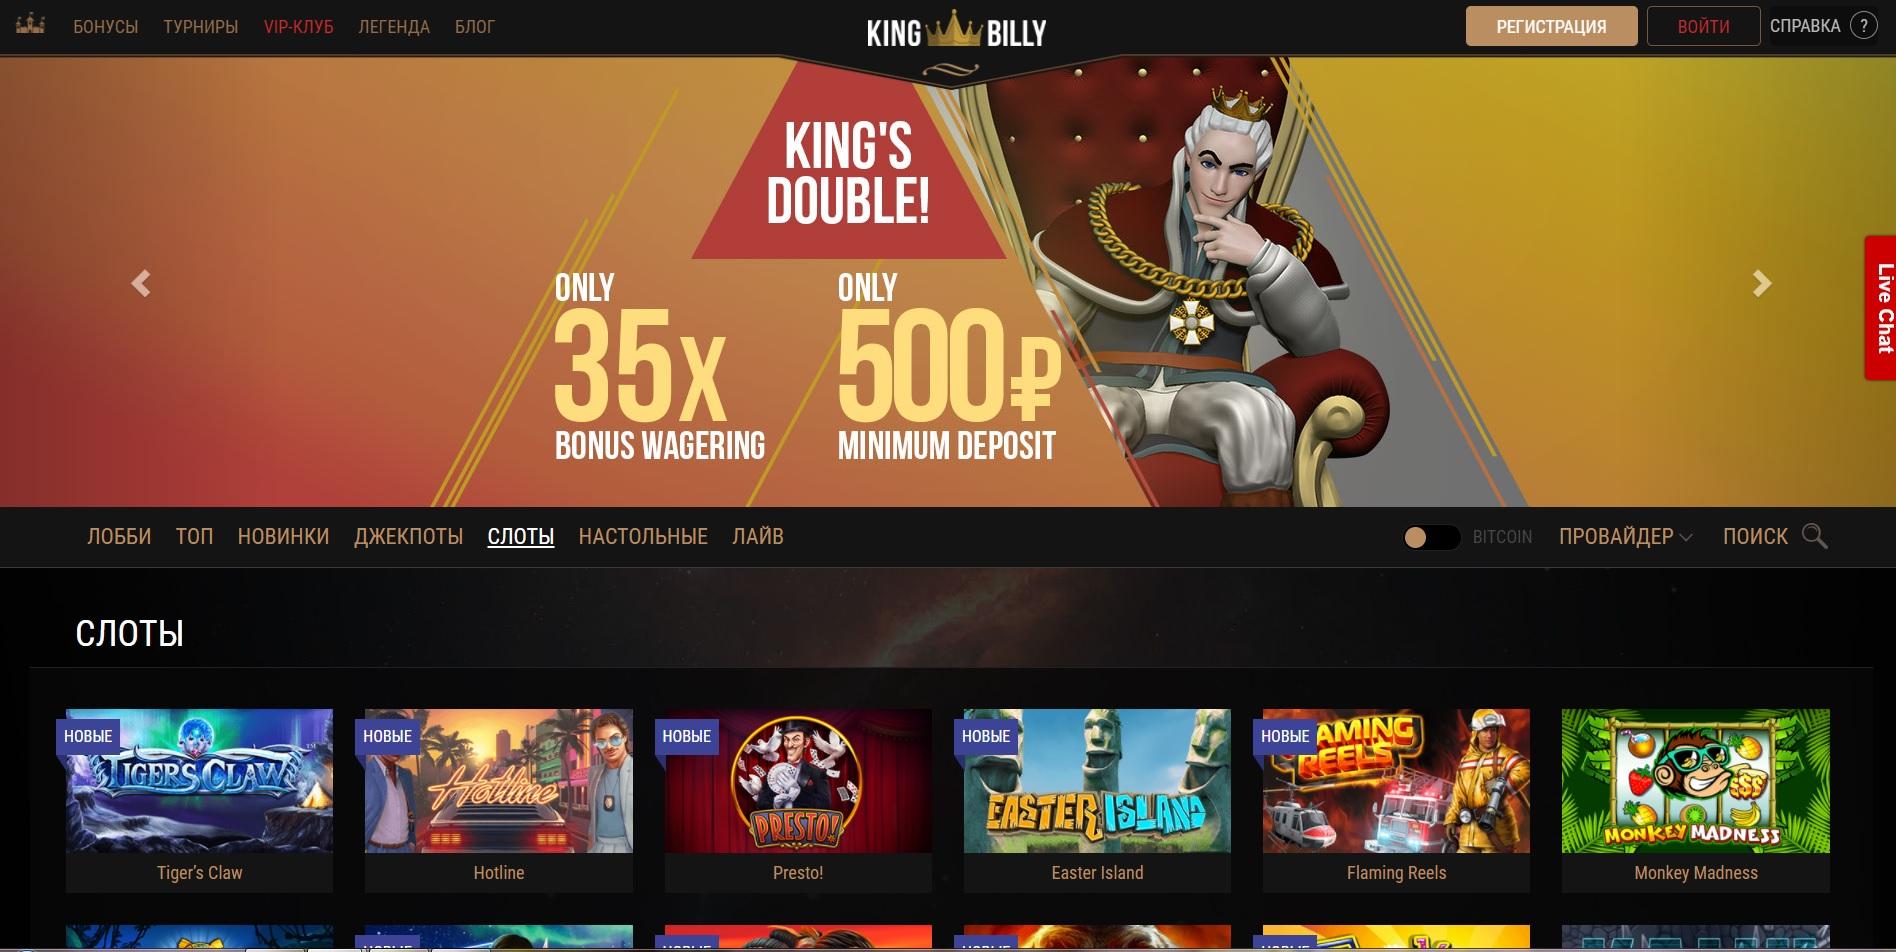 king billy casino обзор, бонус, бездеп